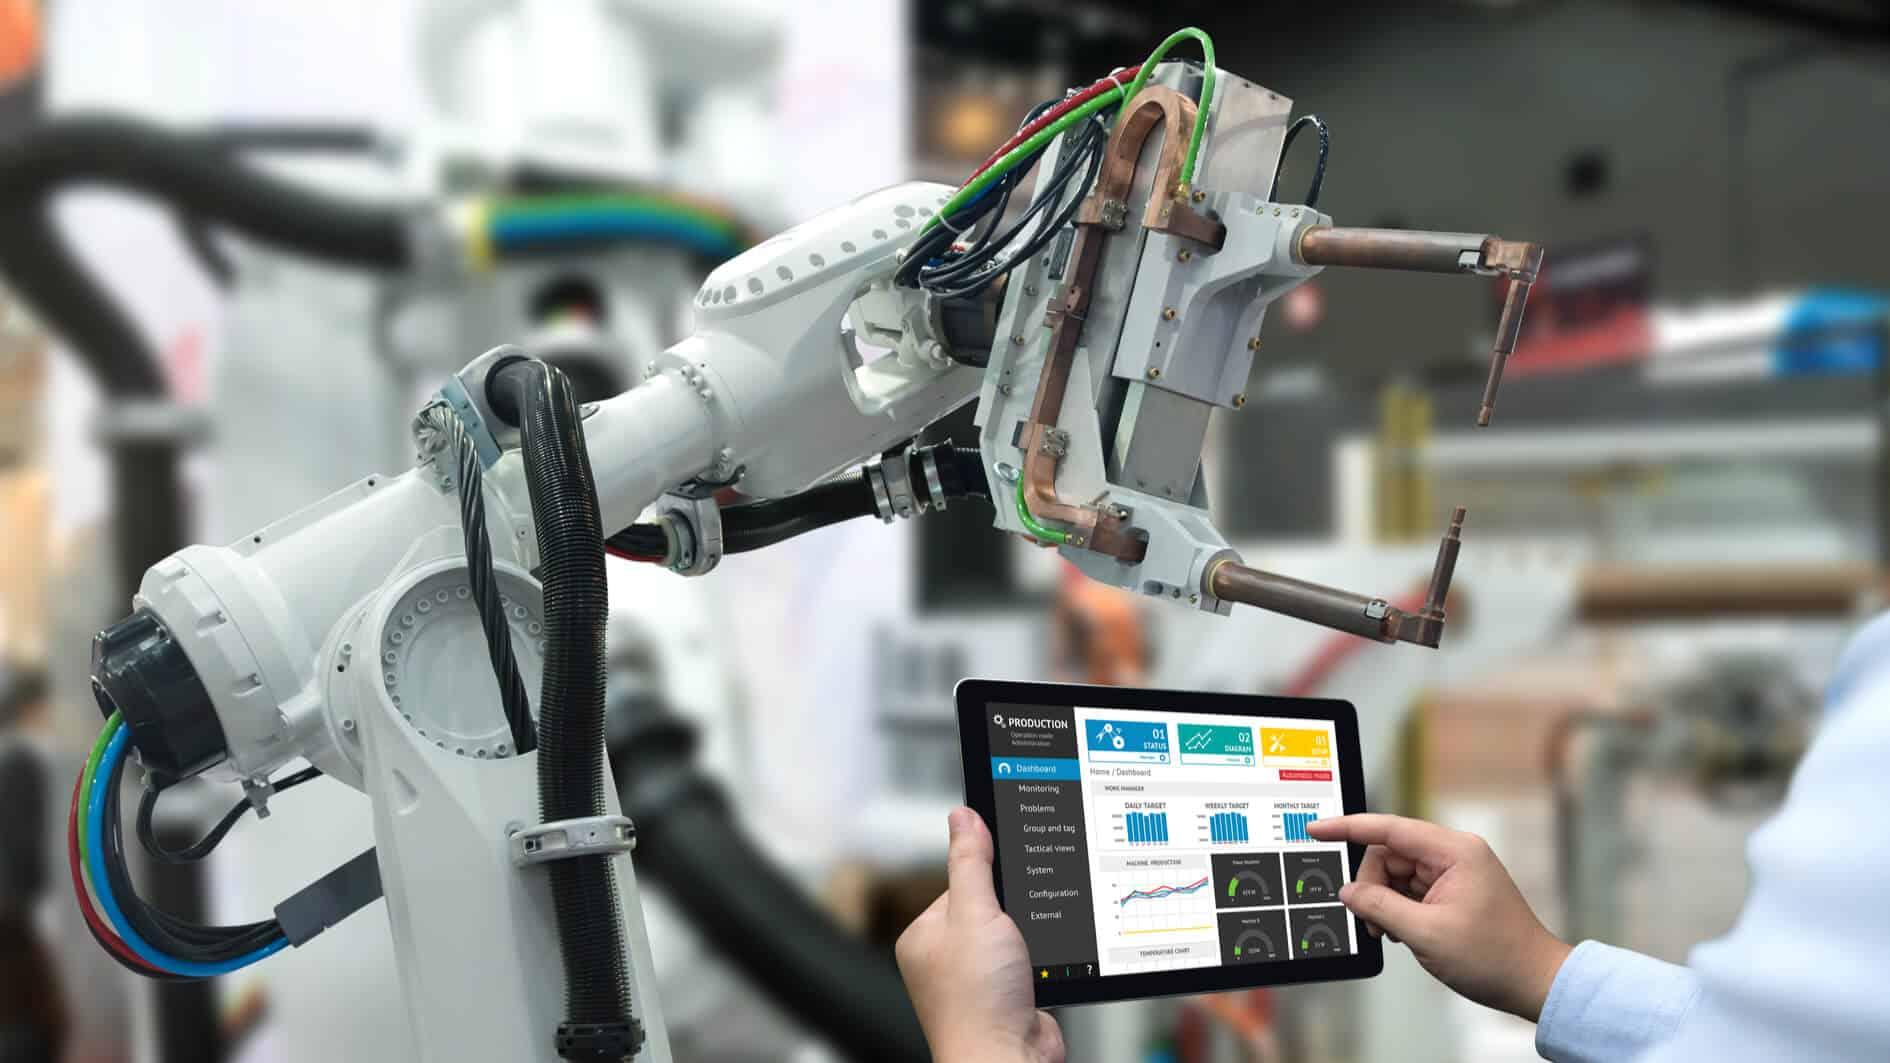 Ketahui Artificial Intelligence dalam Proses Industri Manufaktur